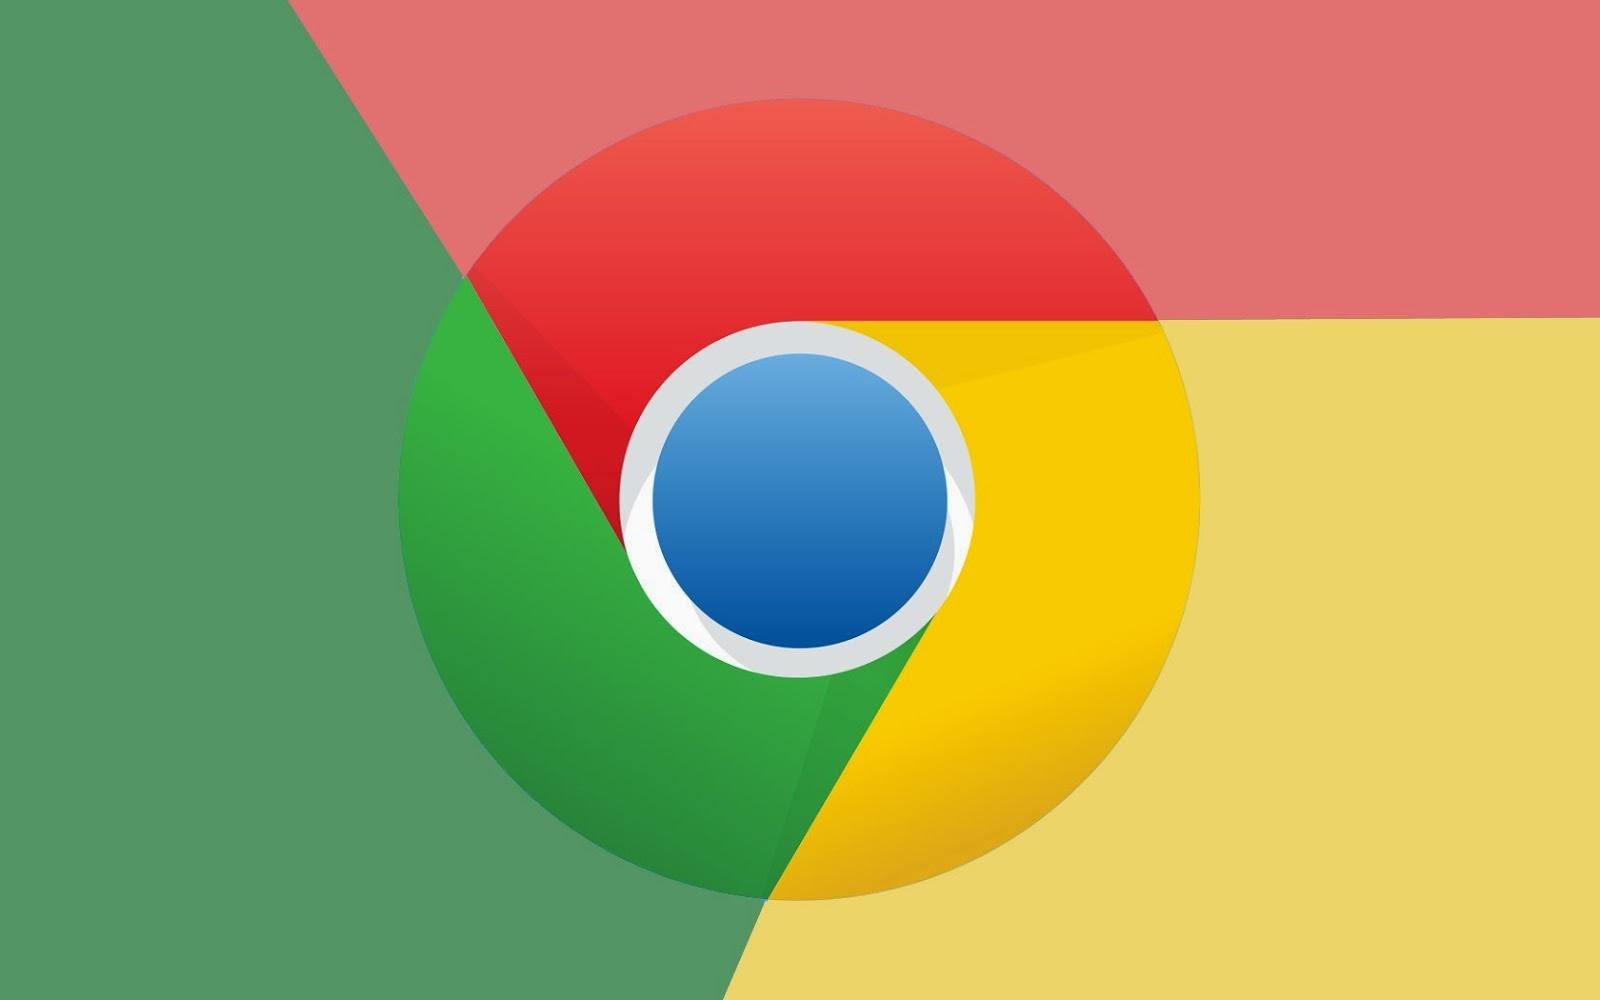 Новый Chrome обновляет вкладку на28% скорее